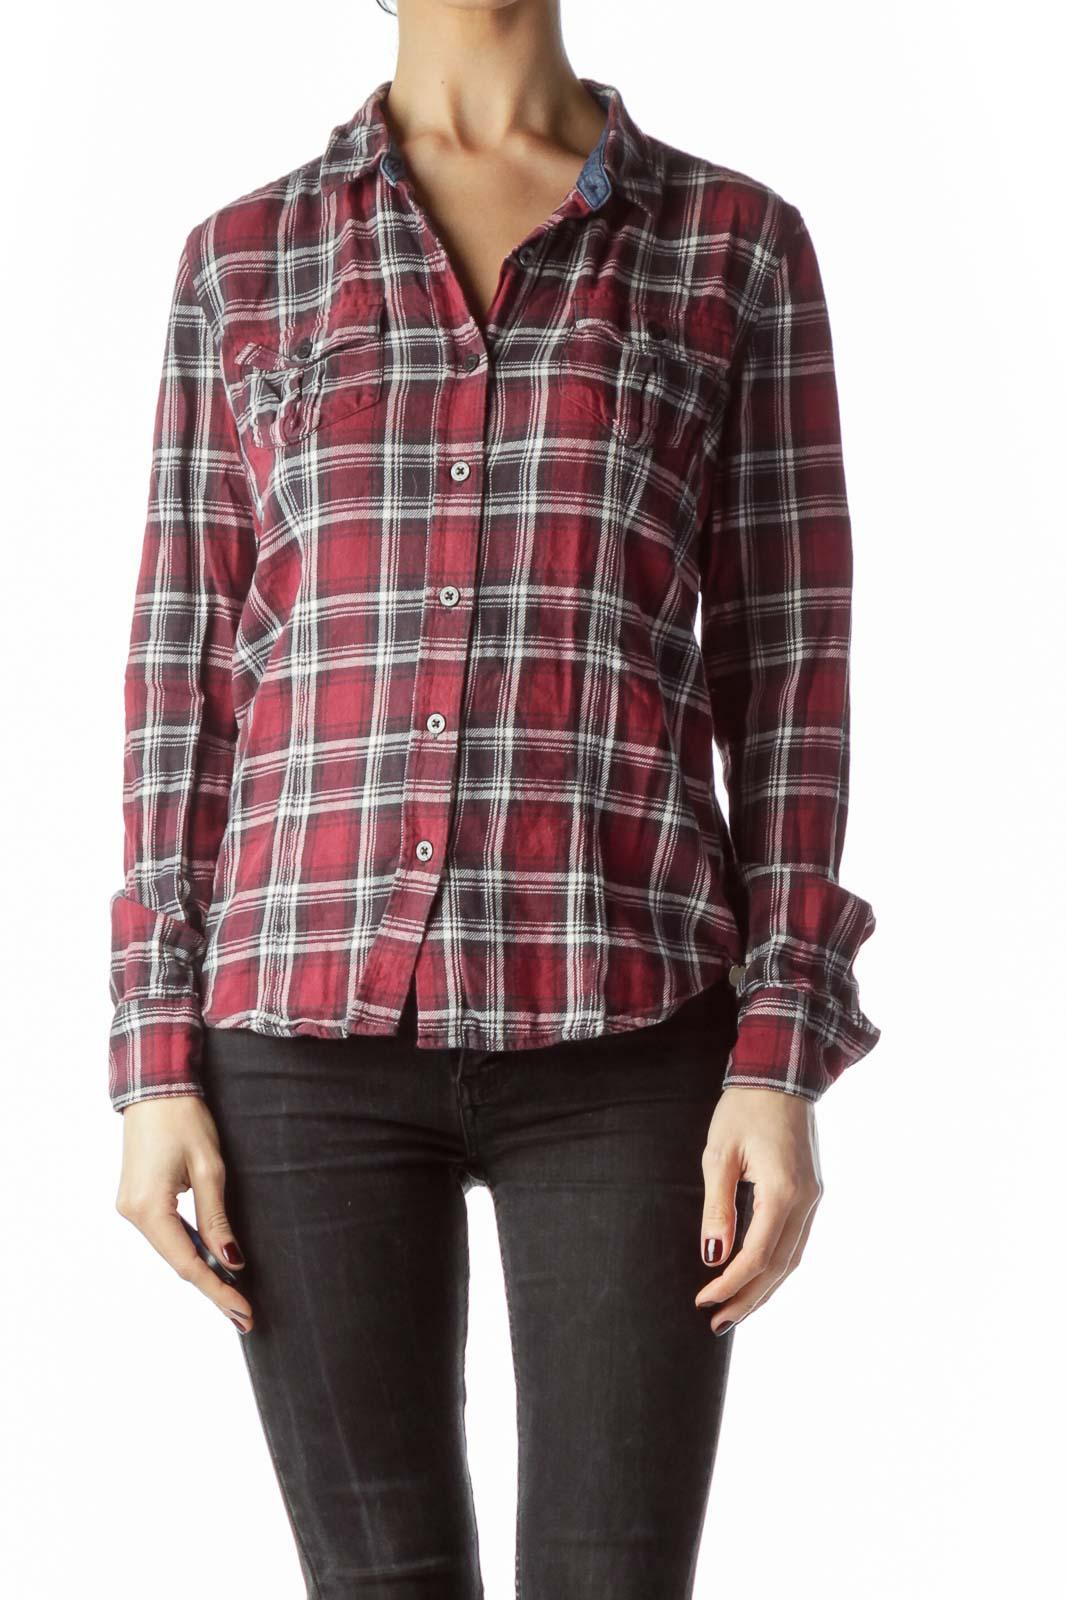 Red Black Cream Plaid Long Sleeve Knit Shirt